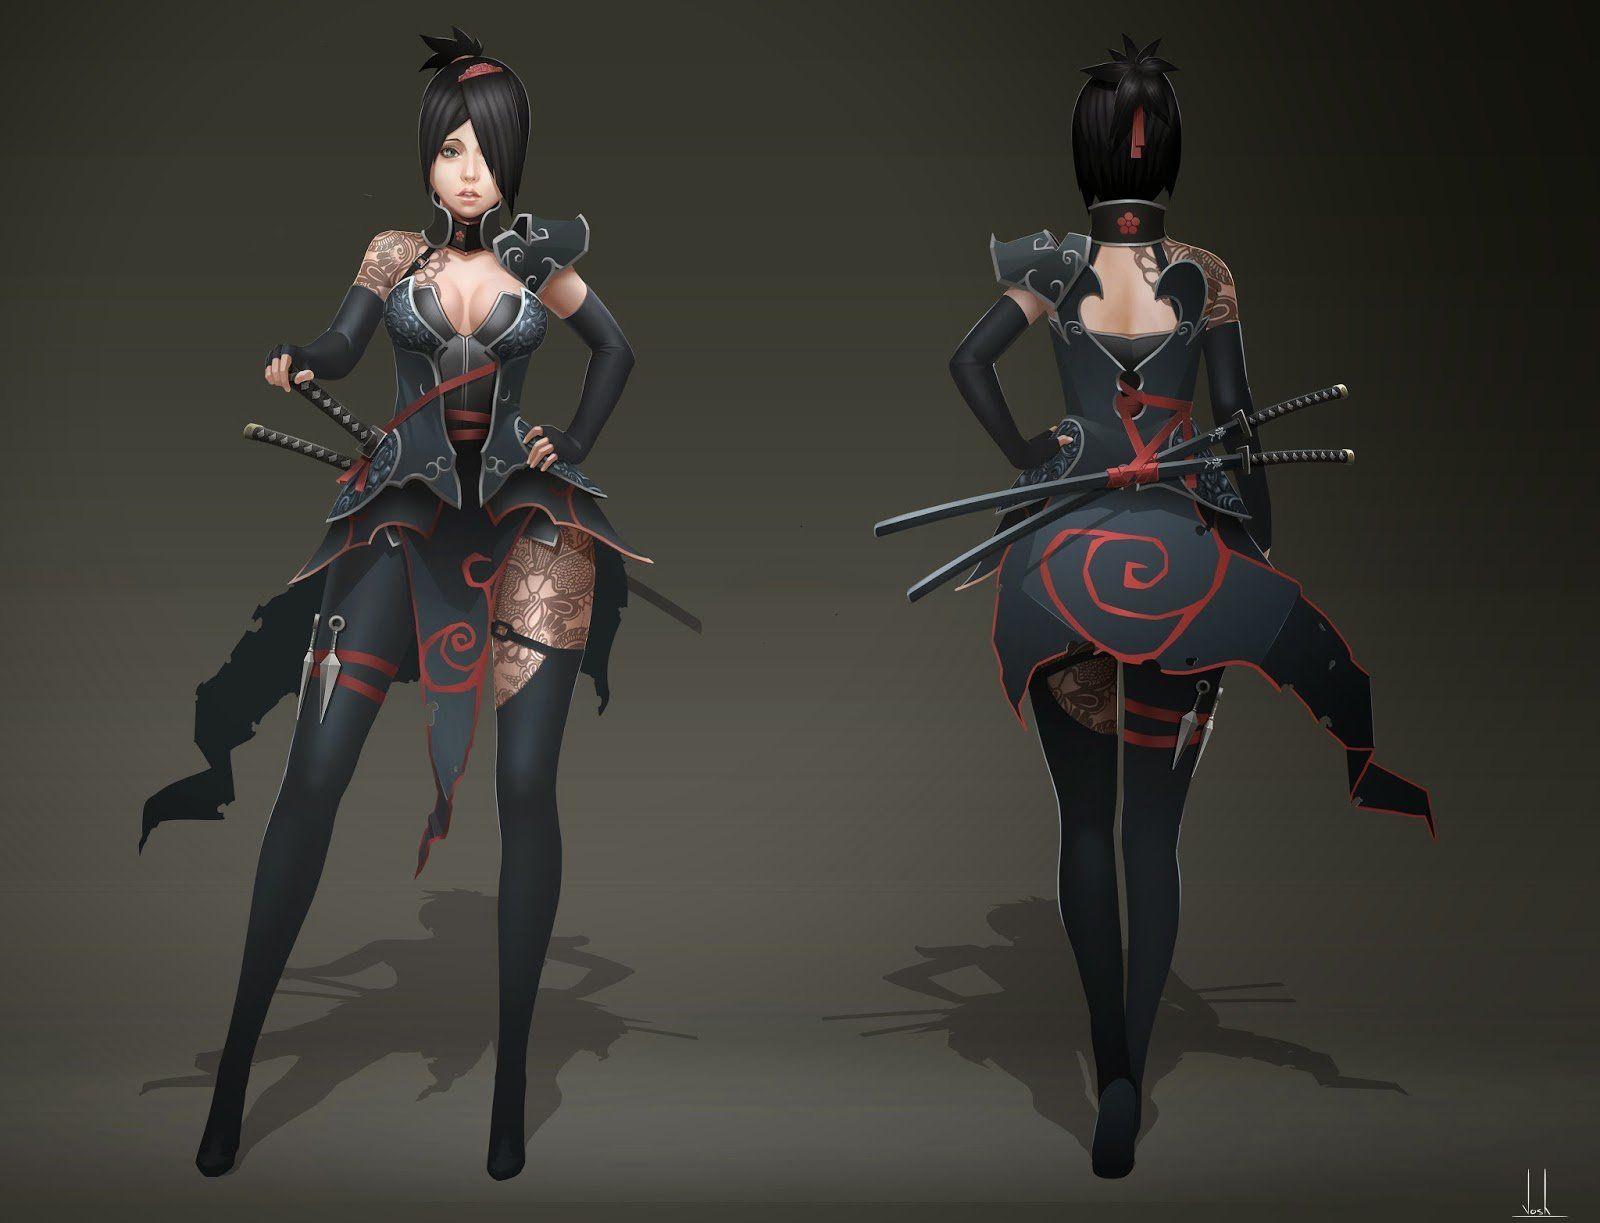 Game Character Design Apps : Samurai ninja 2 joshua xiong on artstation atu2026 game character